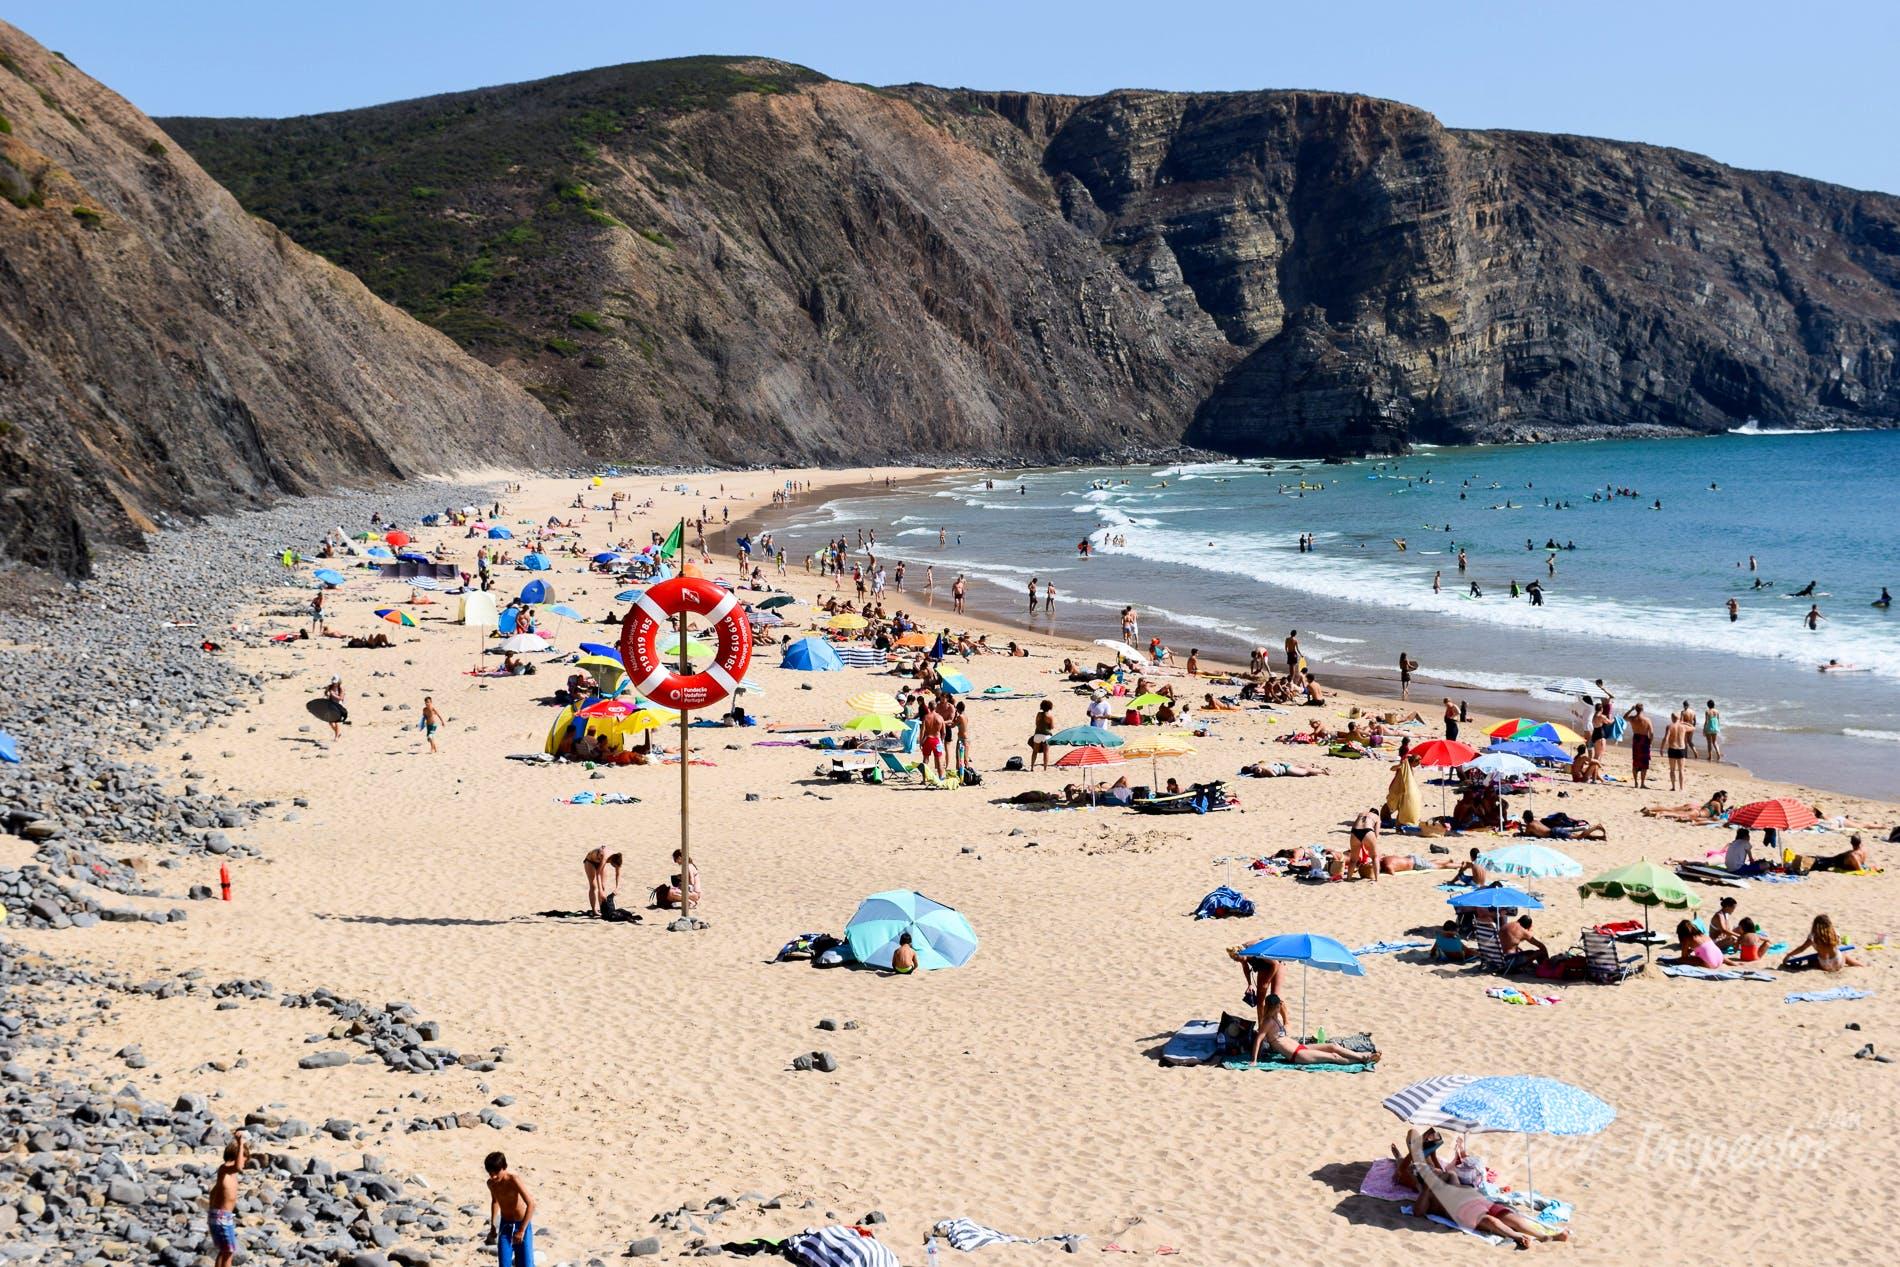 Beach Praia da Arrifana, Algarve, Portugal